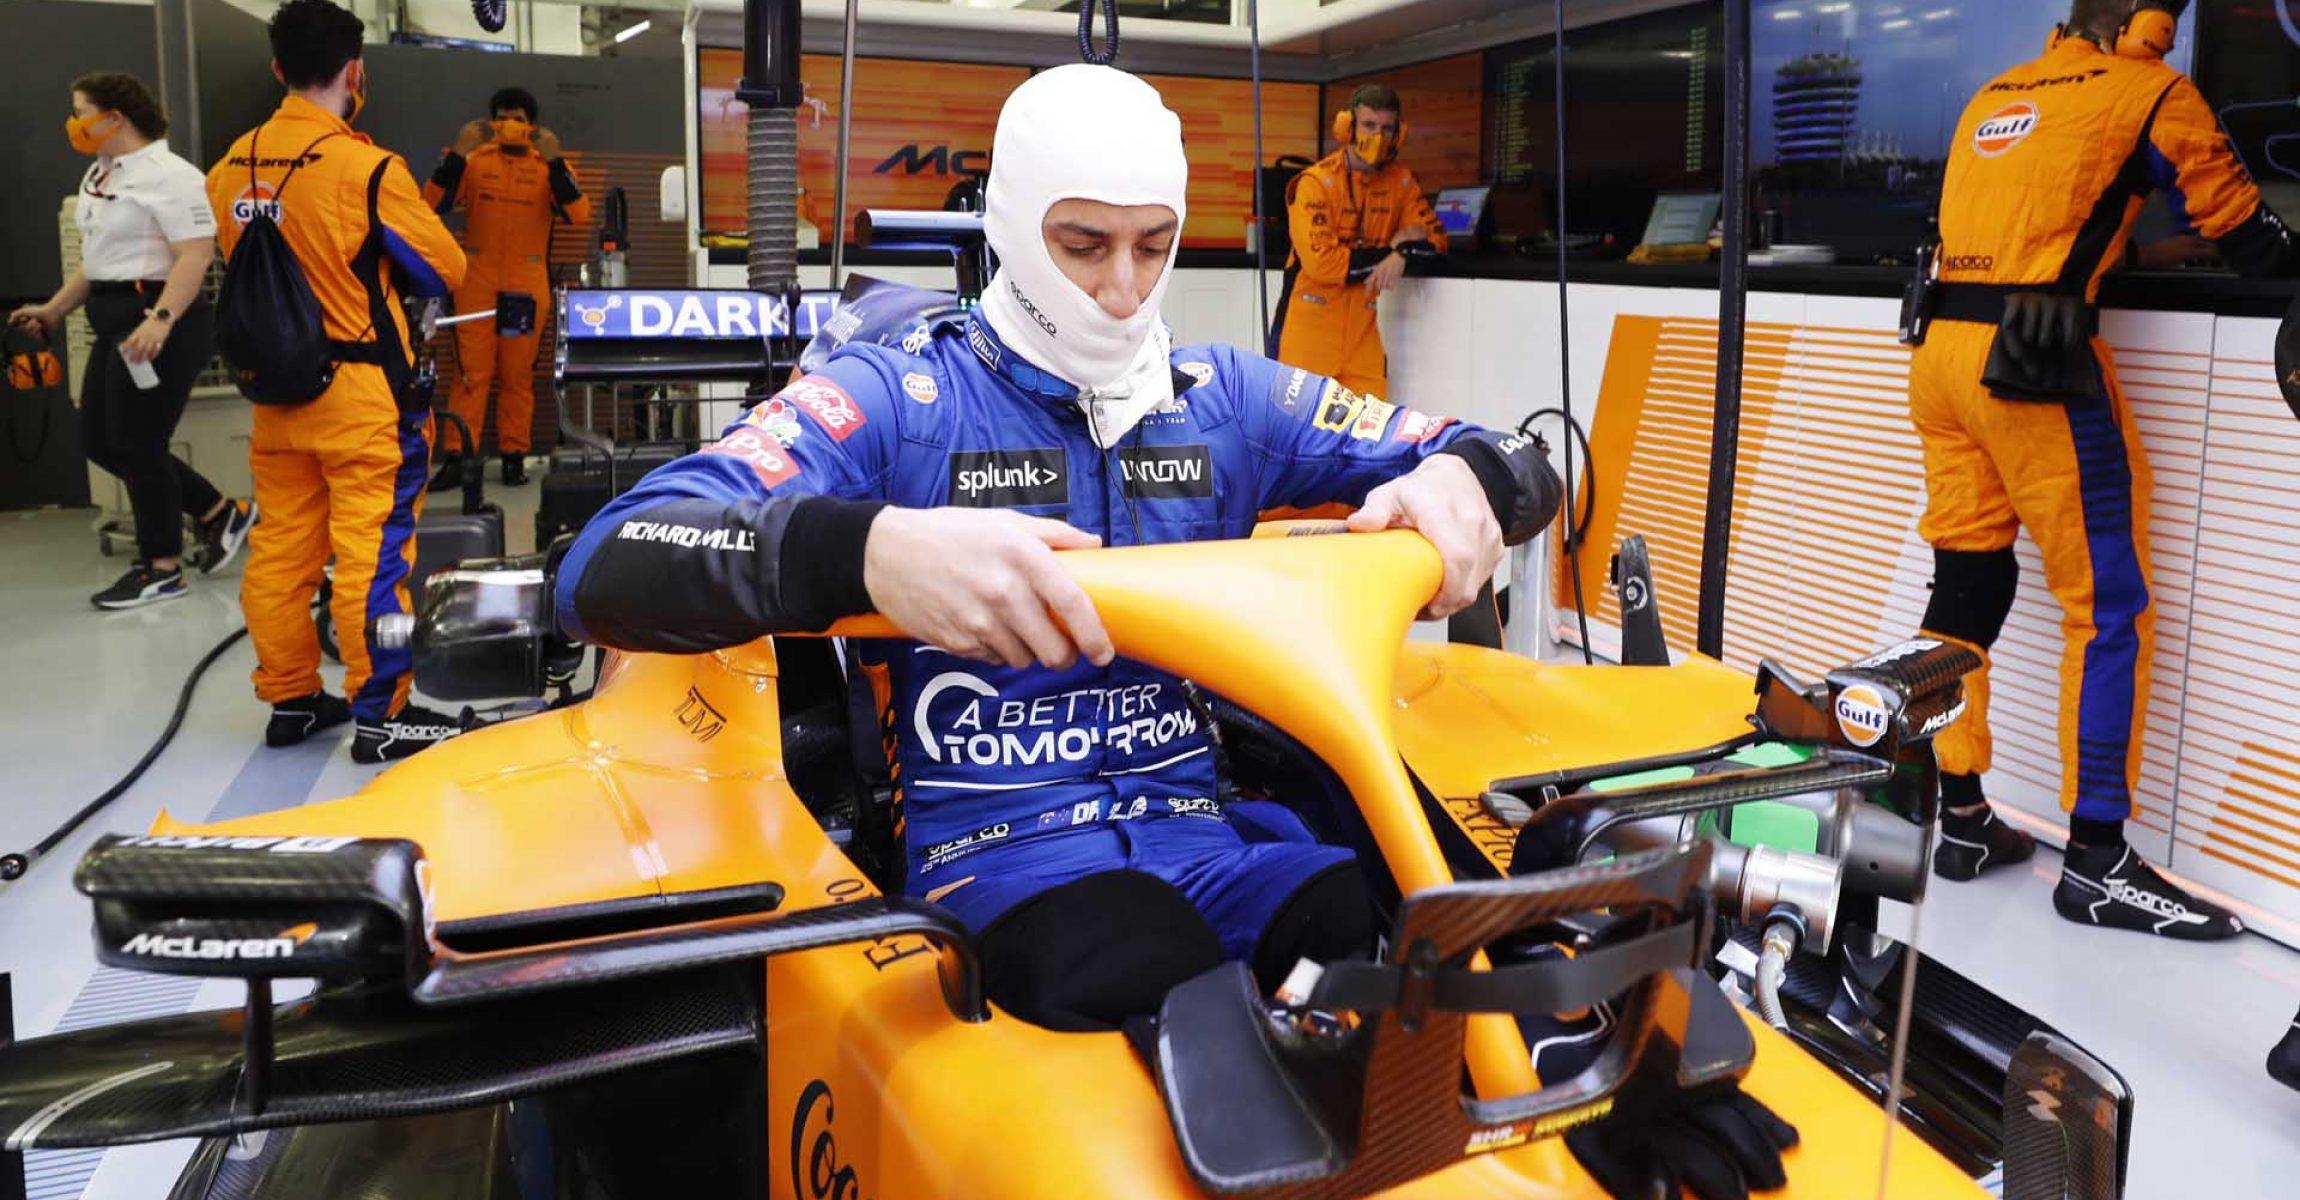 Daniel Ricciardo, McLaren MCL35M, settles into his seat